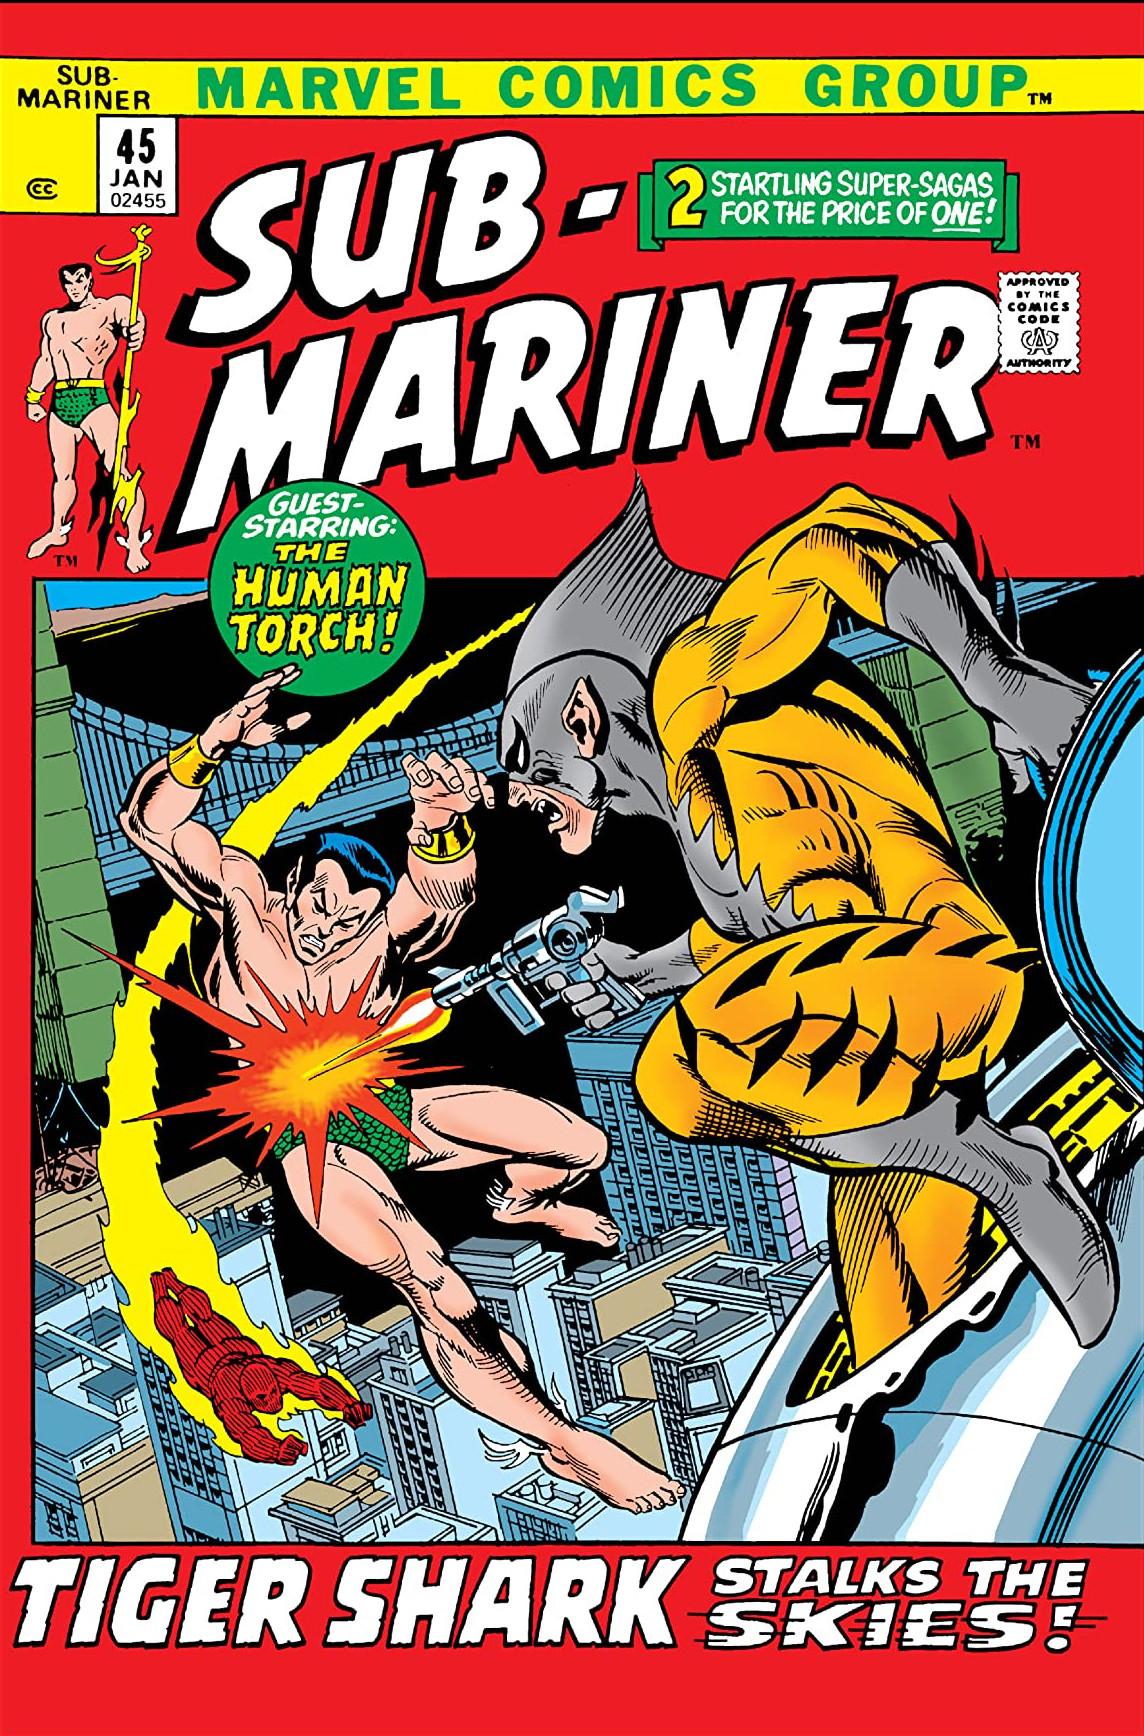 Sub-Mariner Vol 1 45